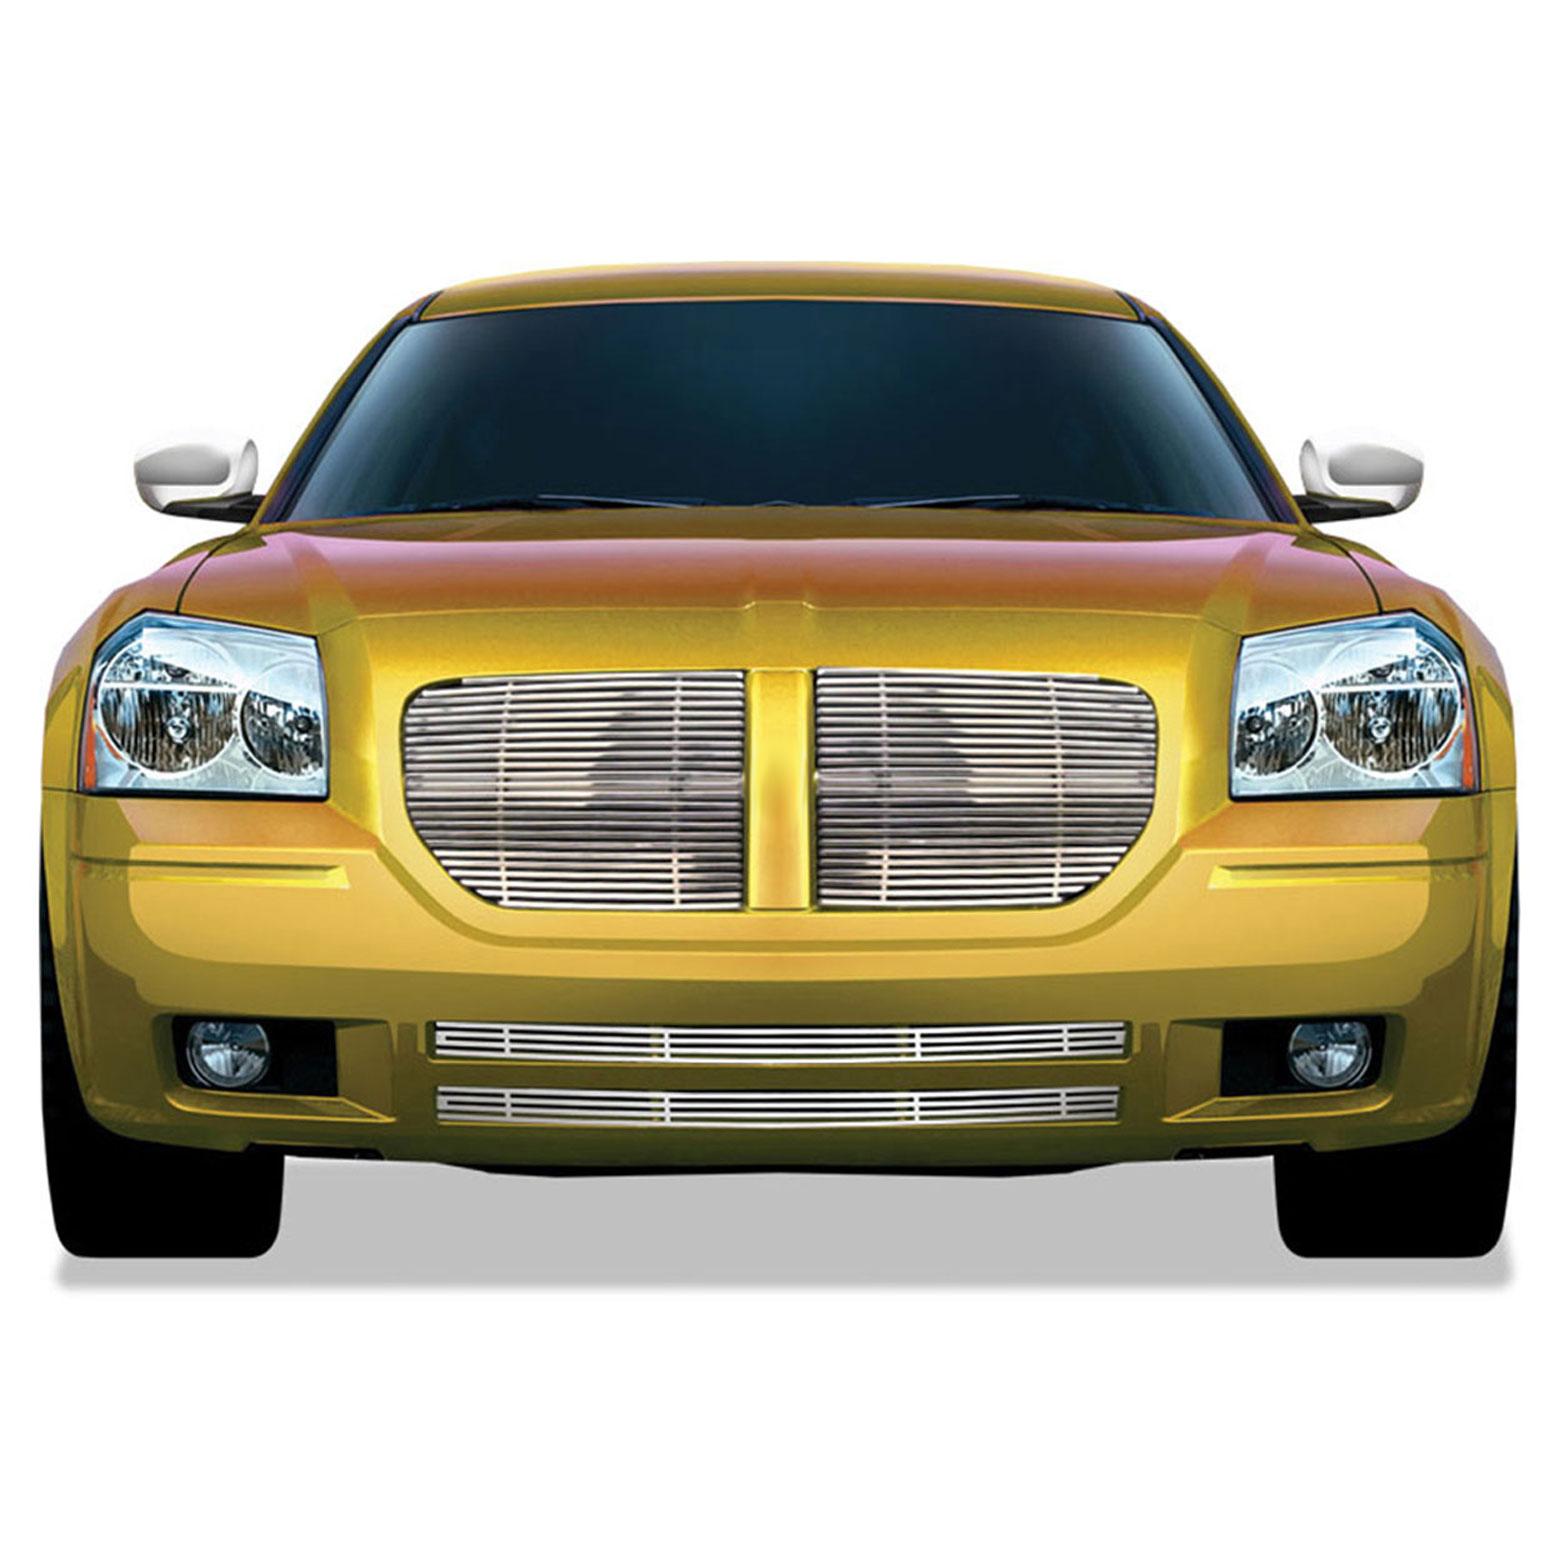 Fits 2005-2007 Dodge Magnum Bumper Stainless Steel Billet Grille Insert